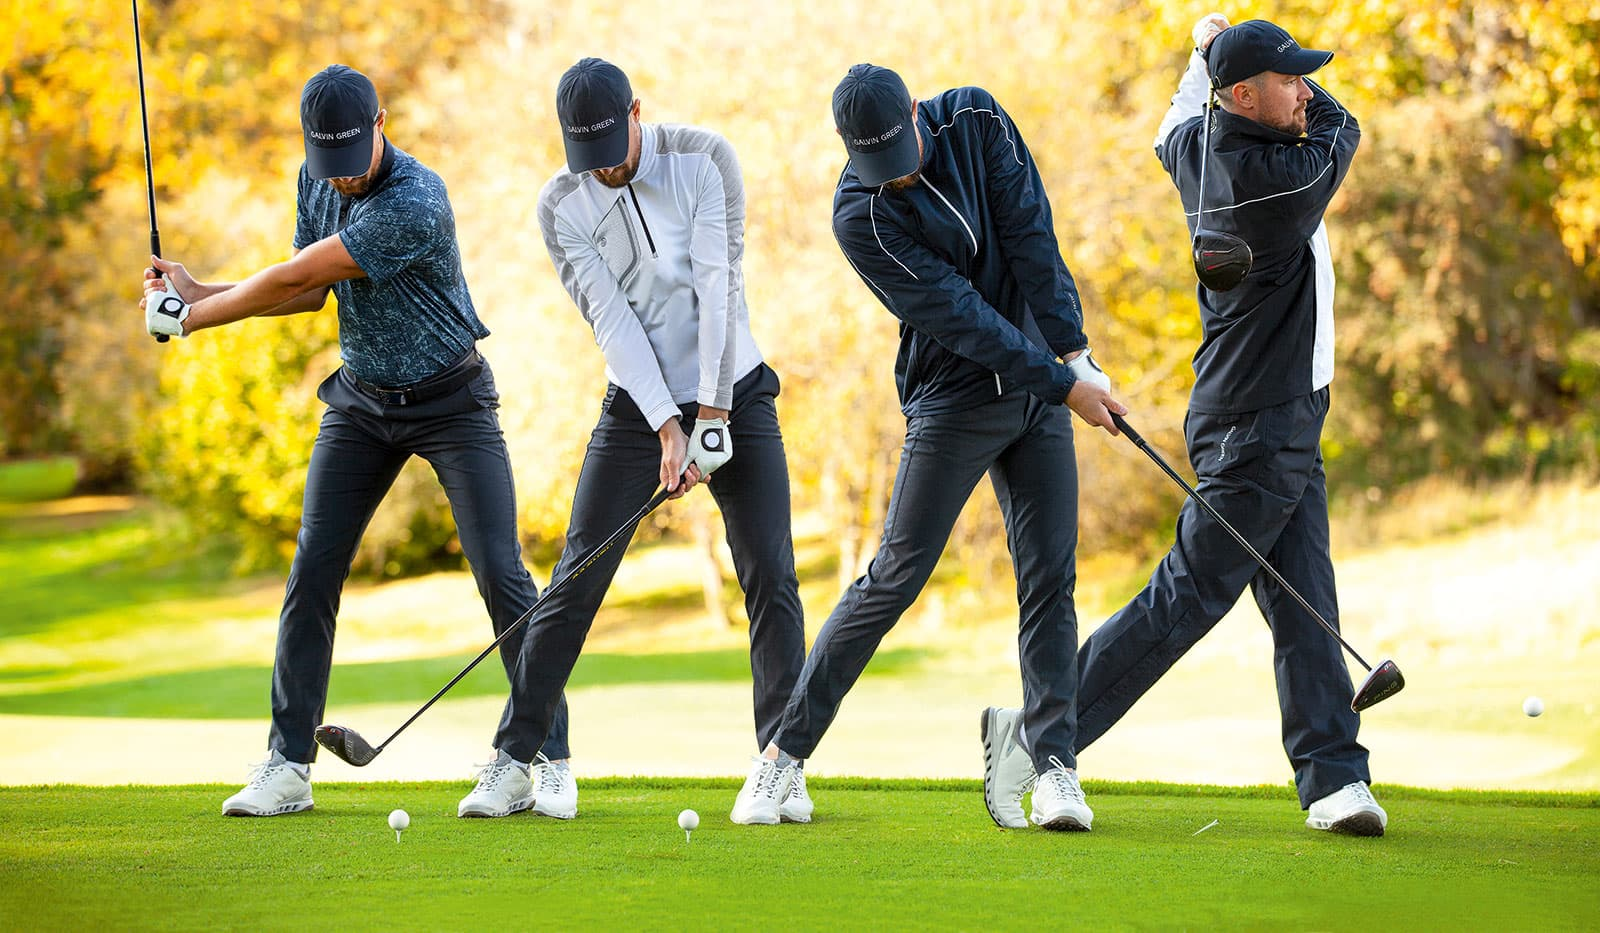 Golfabschlag Step by Step